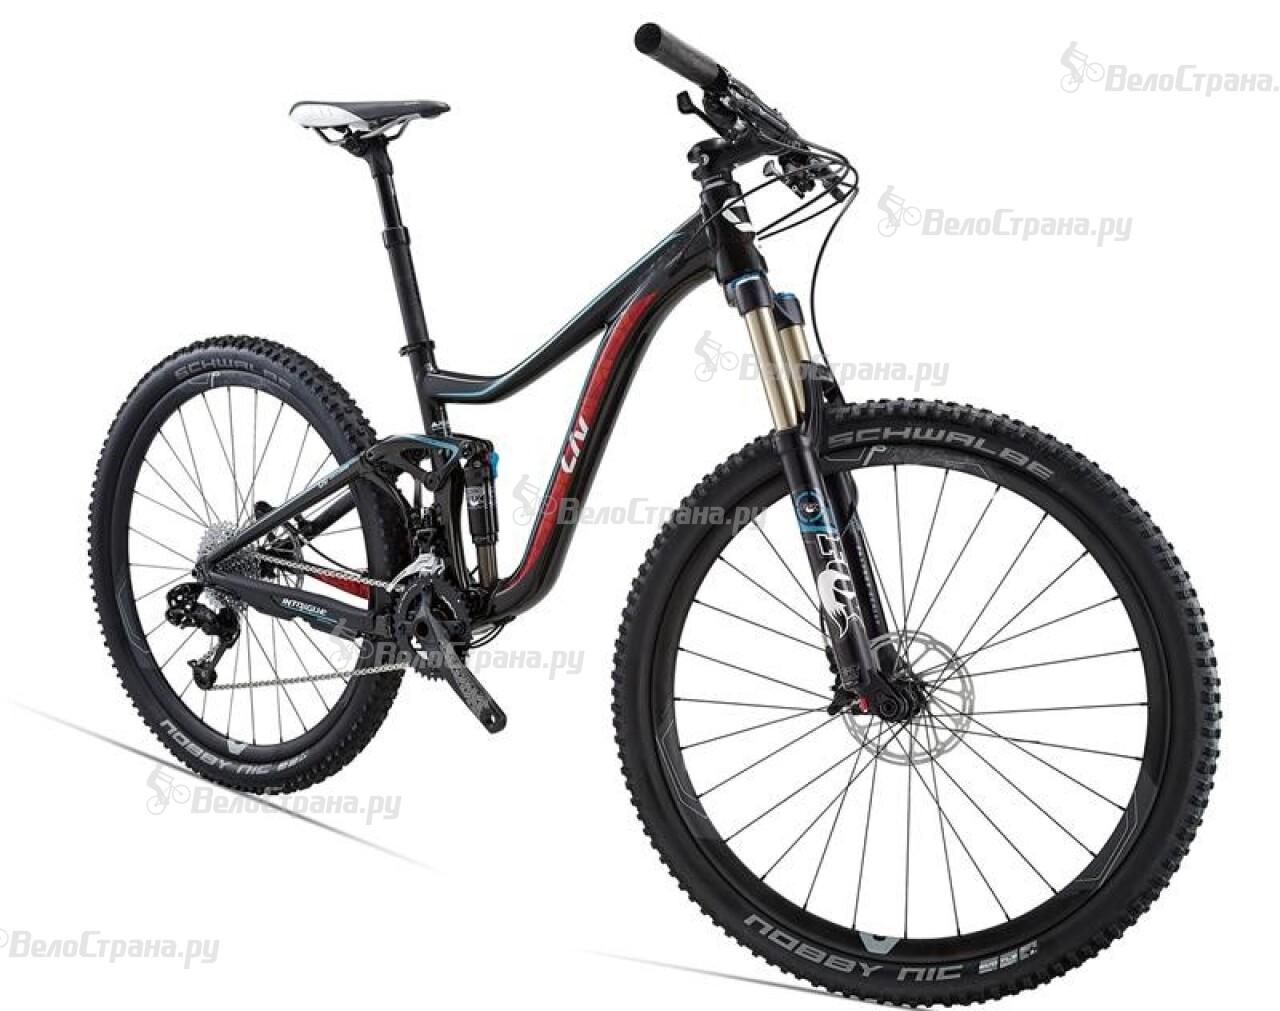 Велосипед Giant Intrigue 1 (2015) велосипед giant intrigue 27 5 2 2015